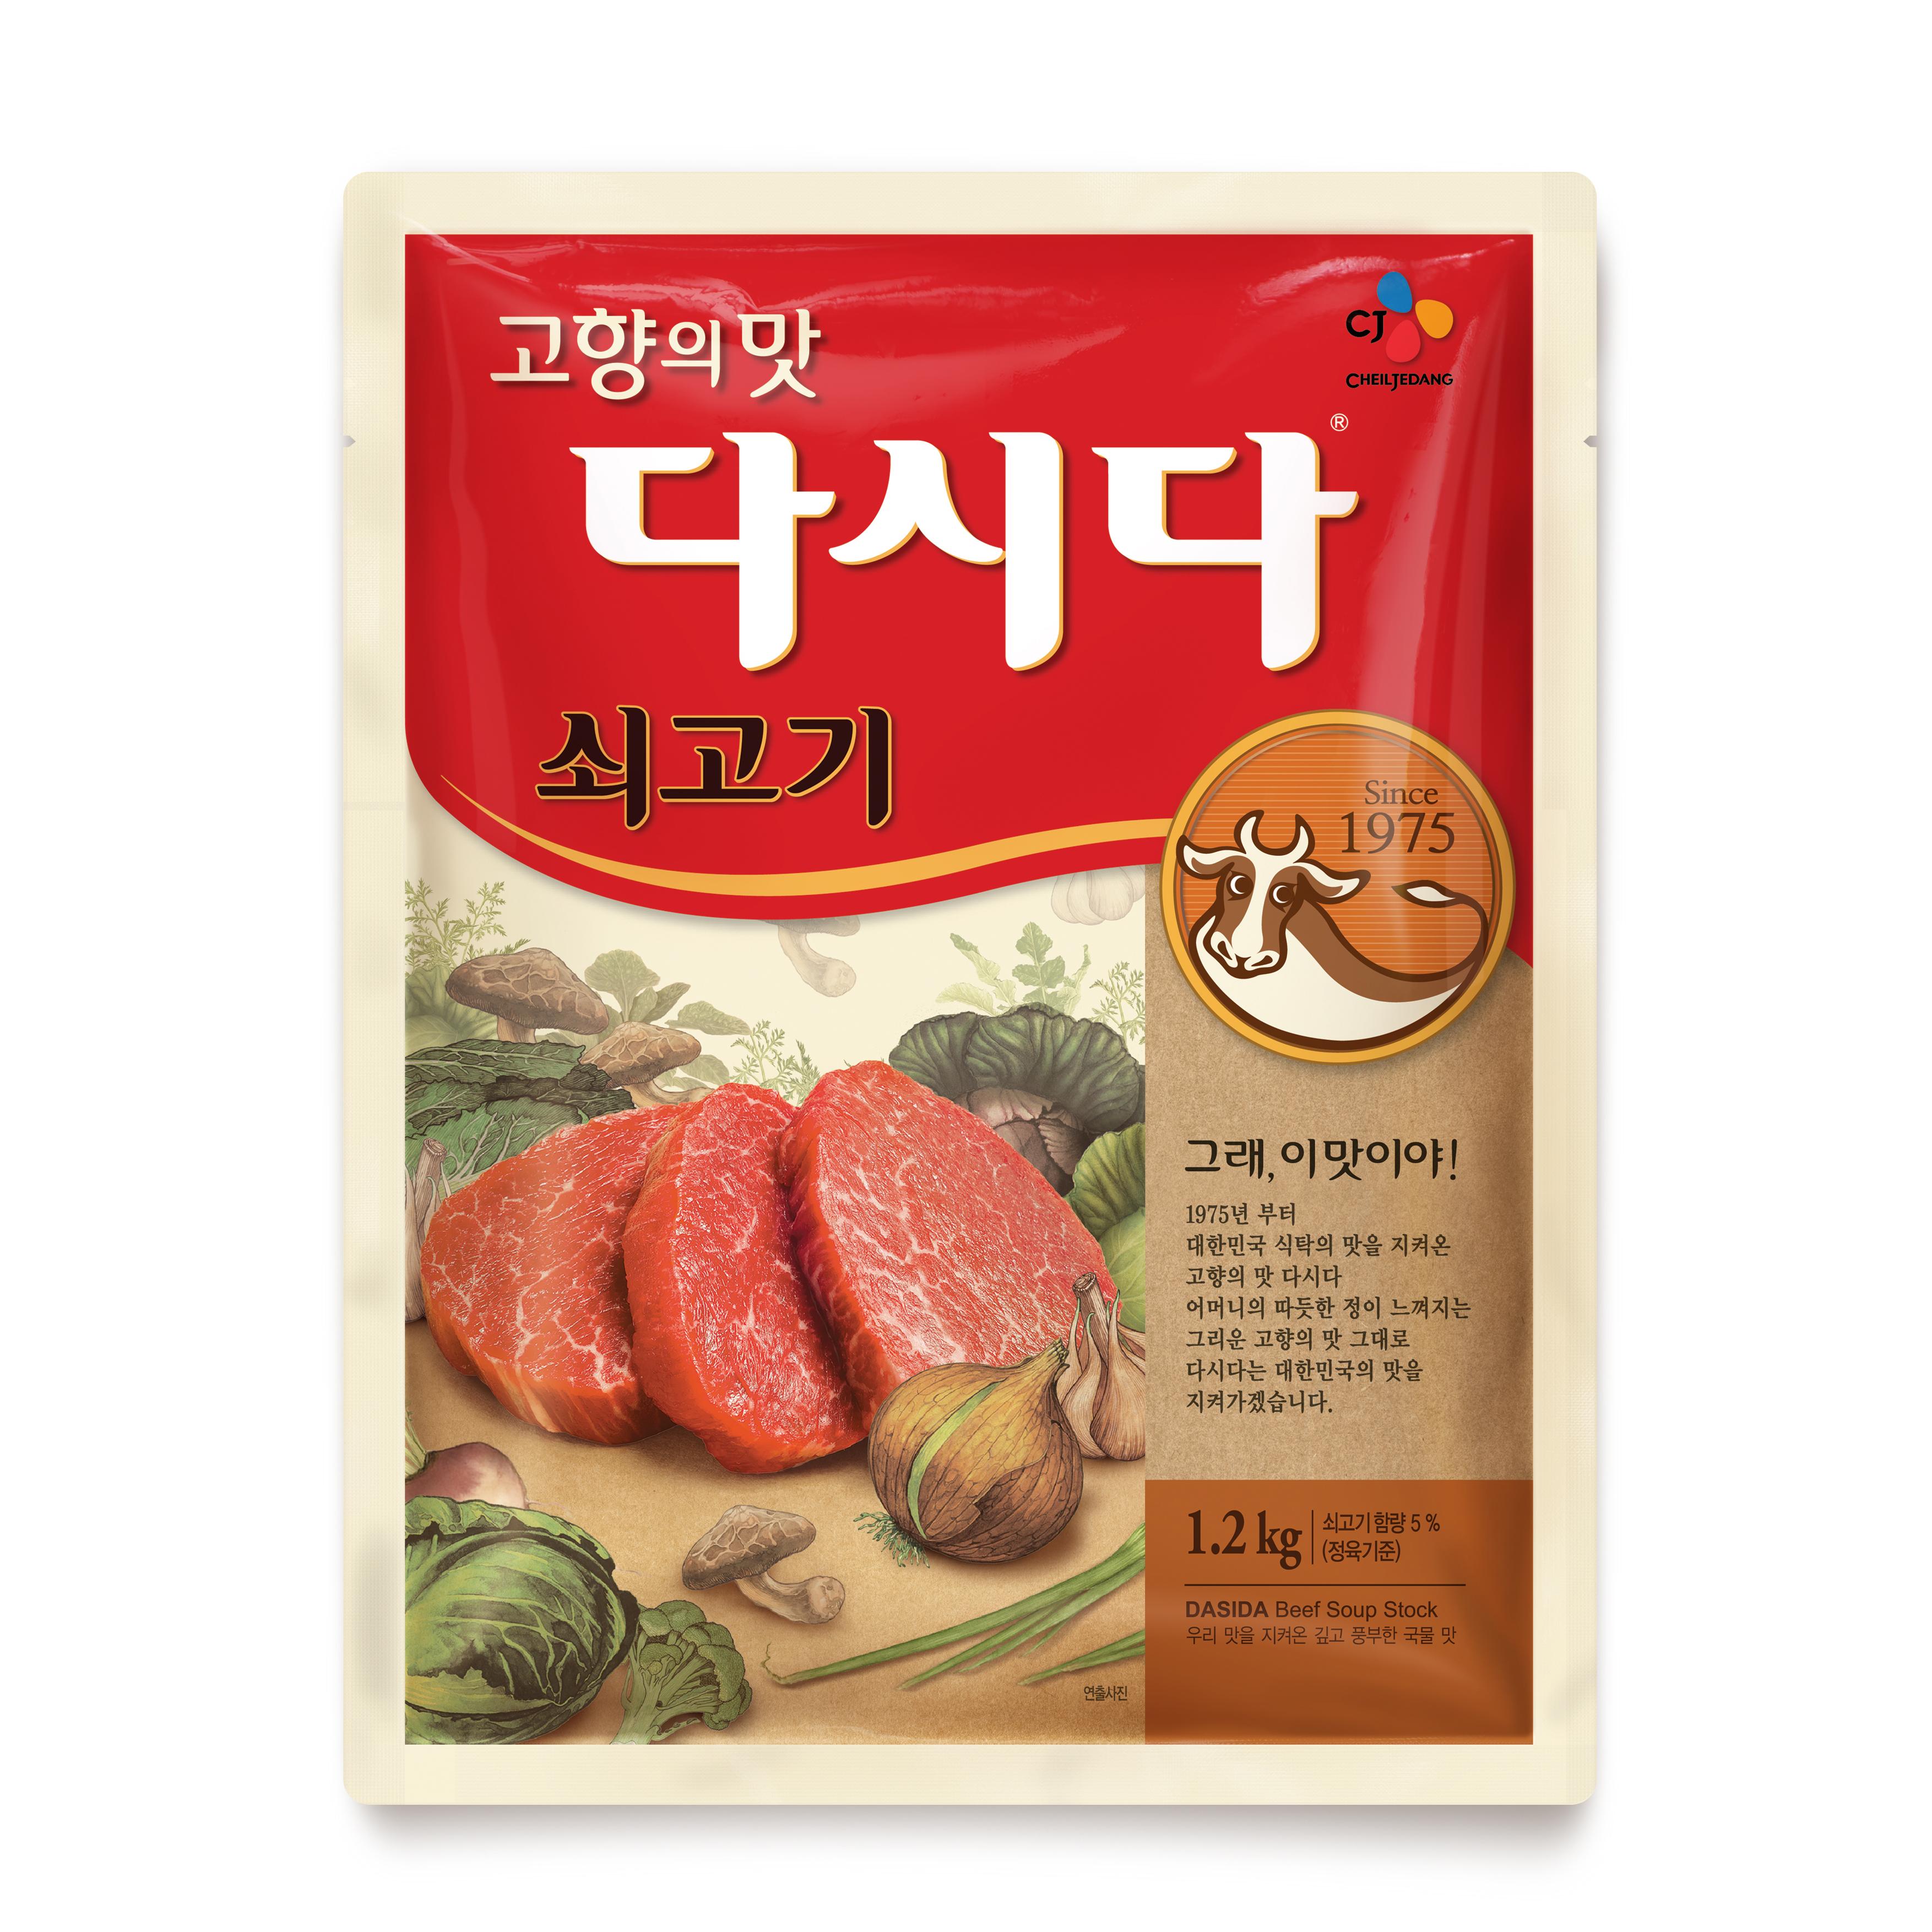 CJ제일제당 다시다 쇠고기, 1.2kg, 1개